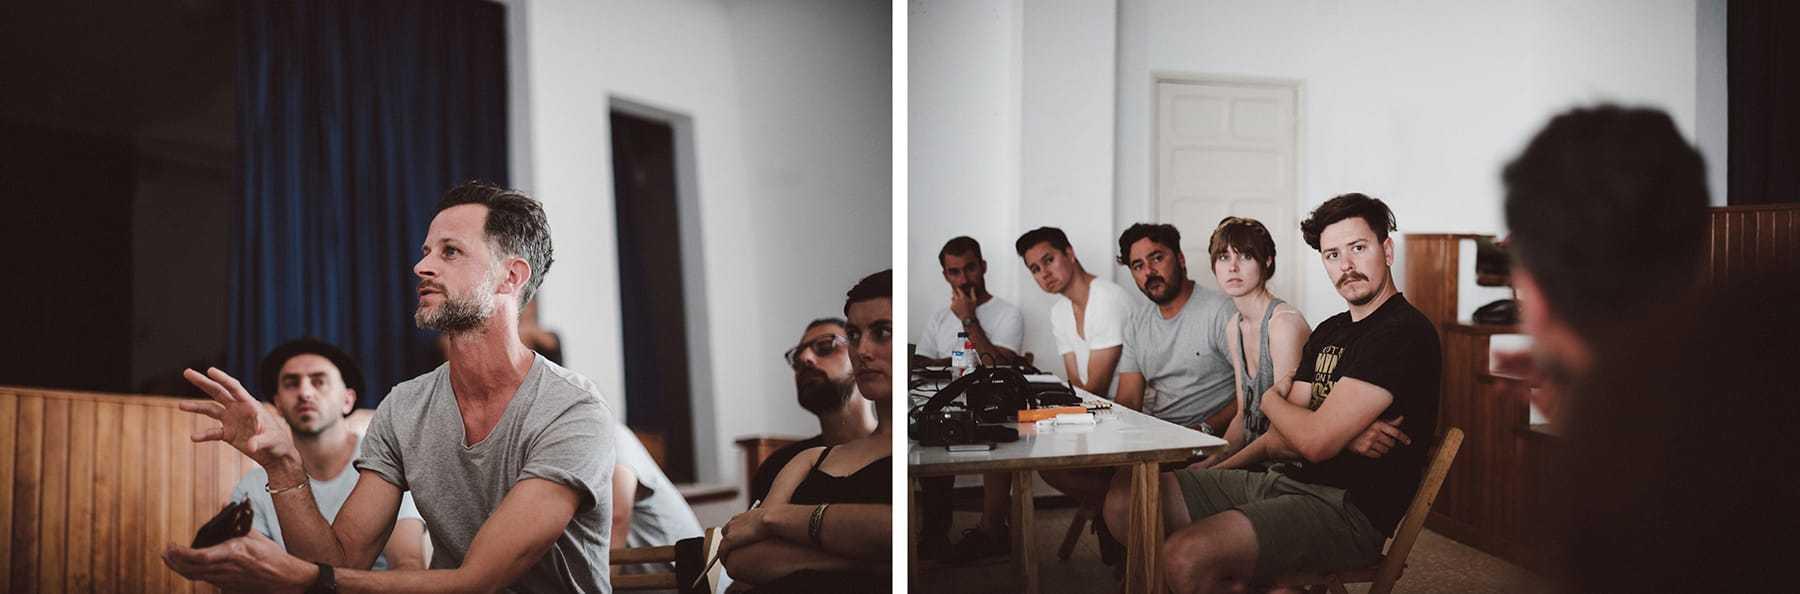 wolves_workshop_hilario_sanchez_fotografo_boda_españa_197